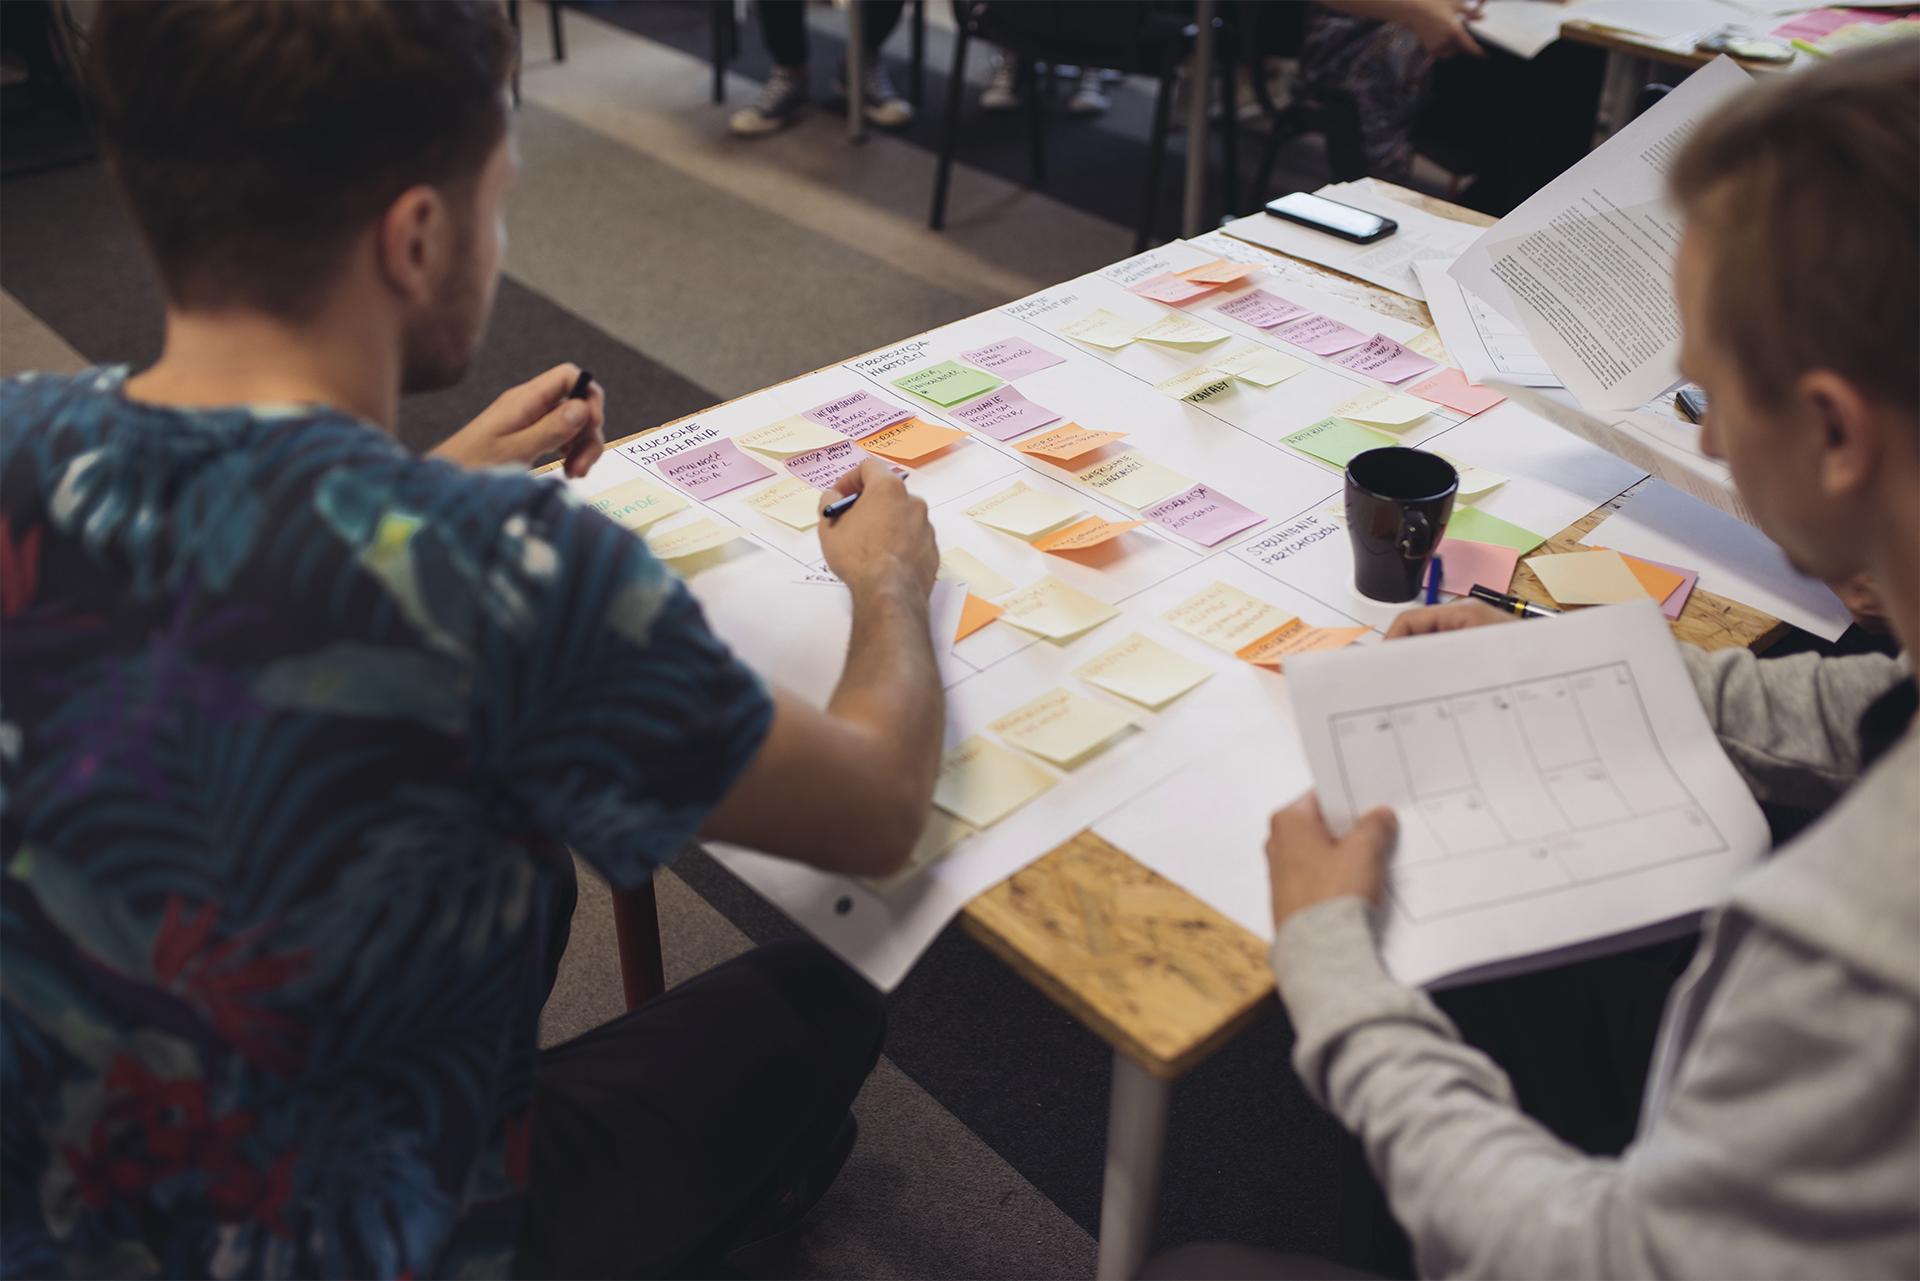 warsztaty-design-thinking